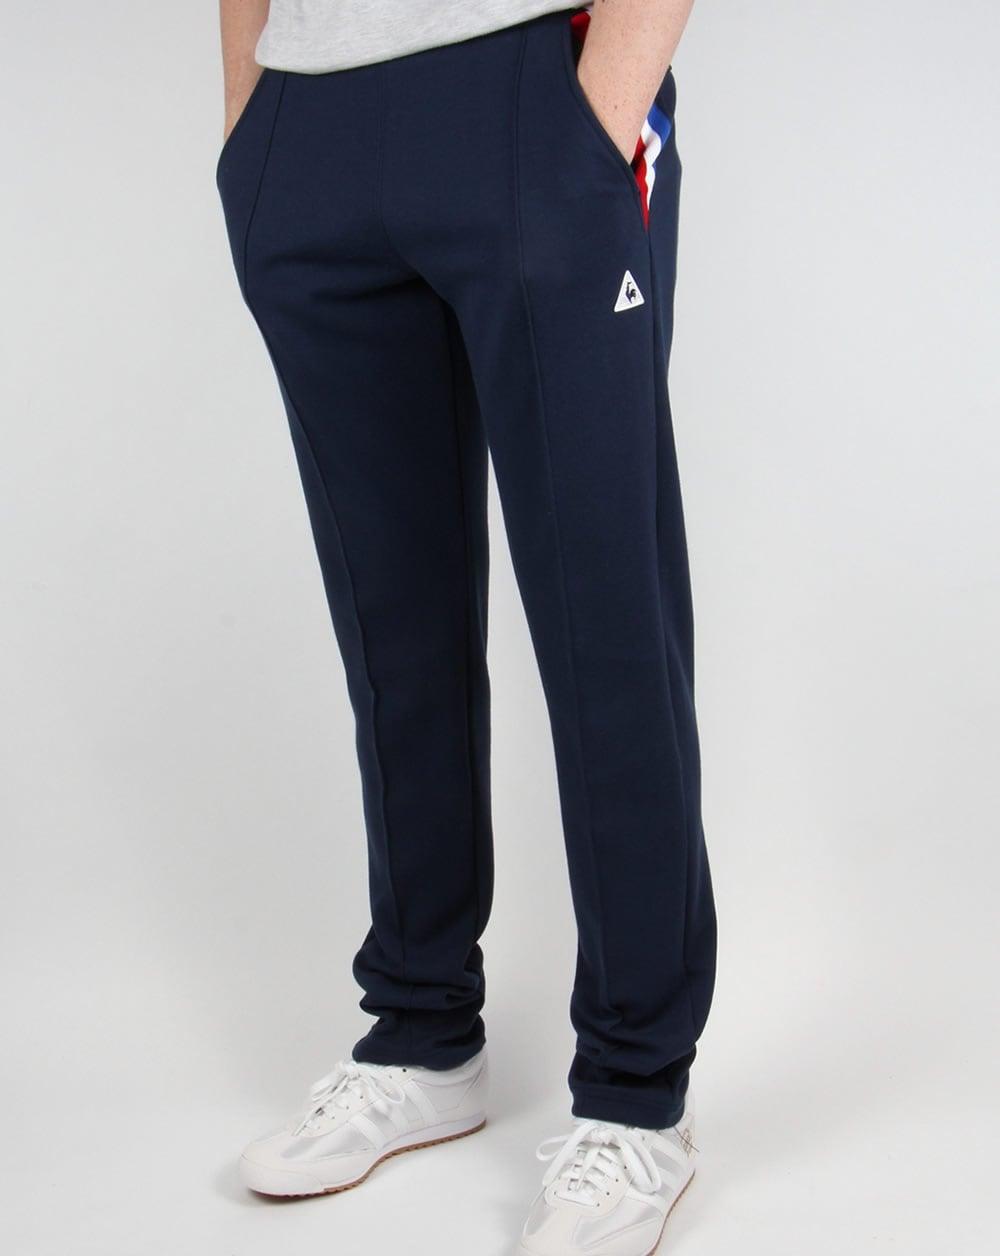 le coq sportif tricolore track pants navy tracksuit bottoms mens. Black Bedroom Furniture Sets. Home Design Ideas